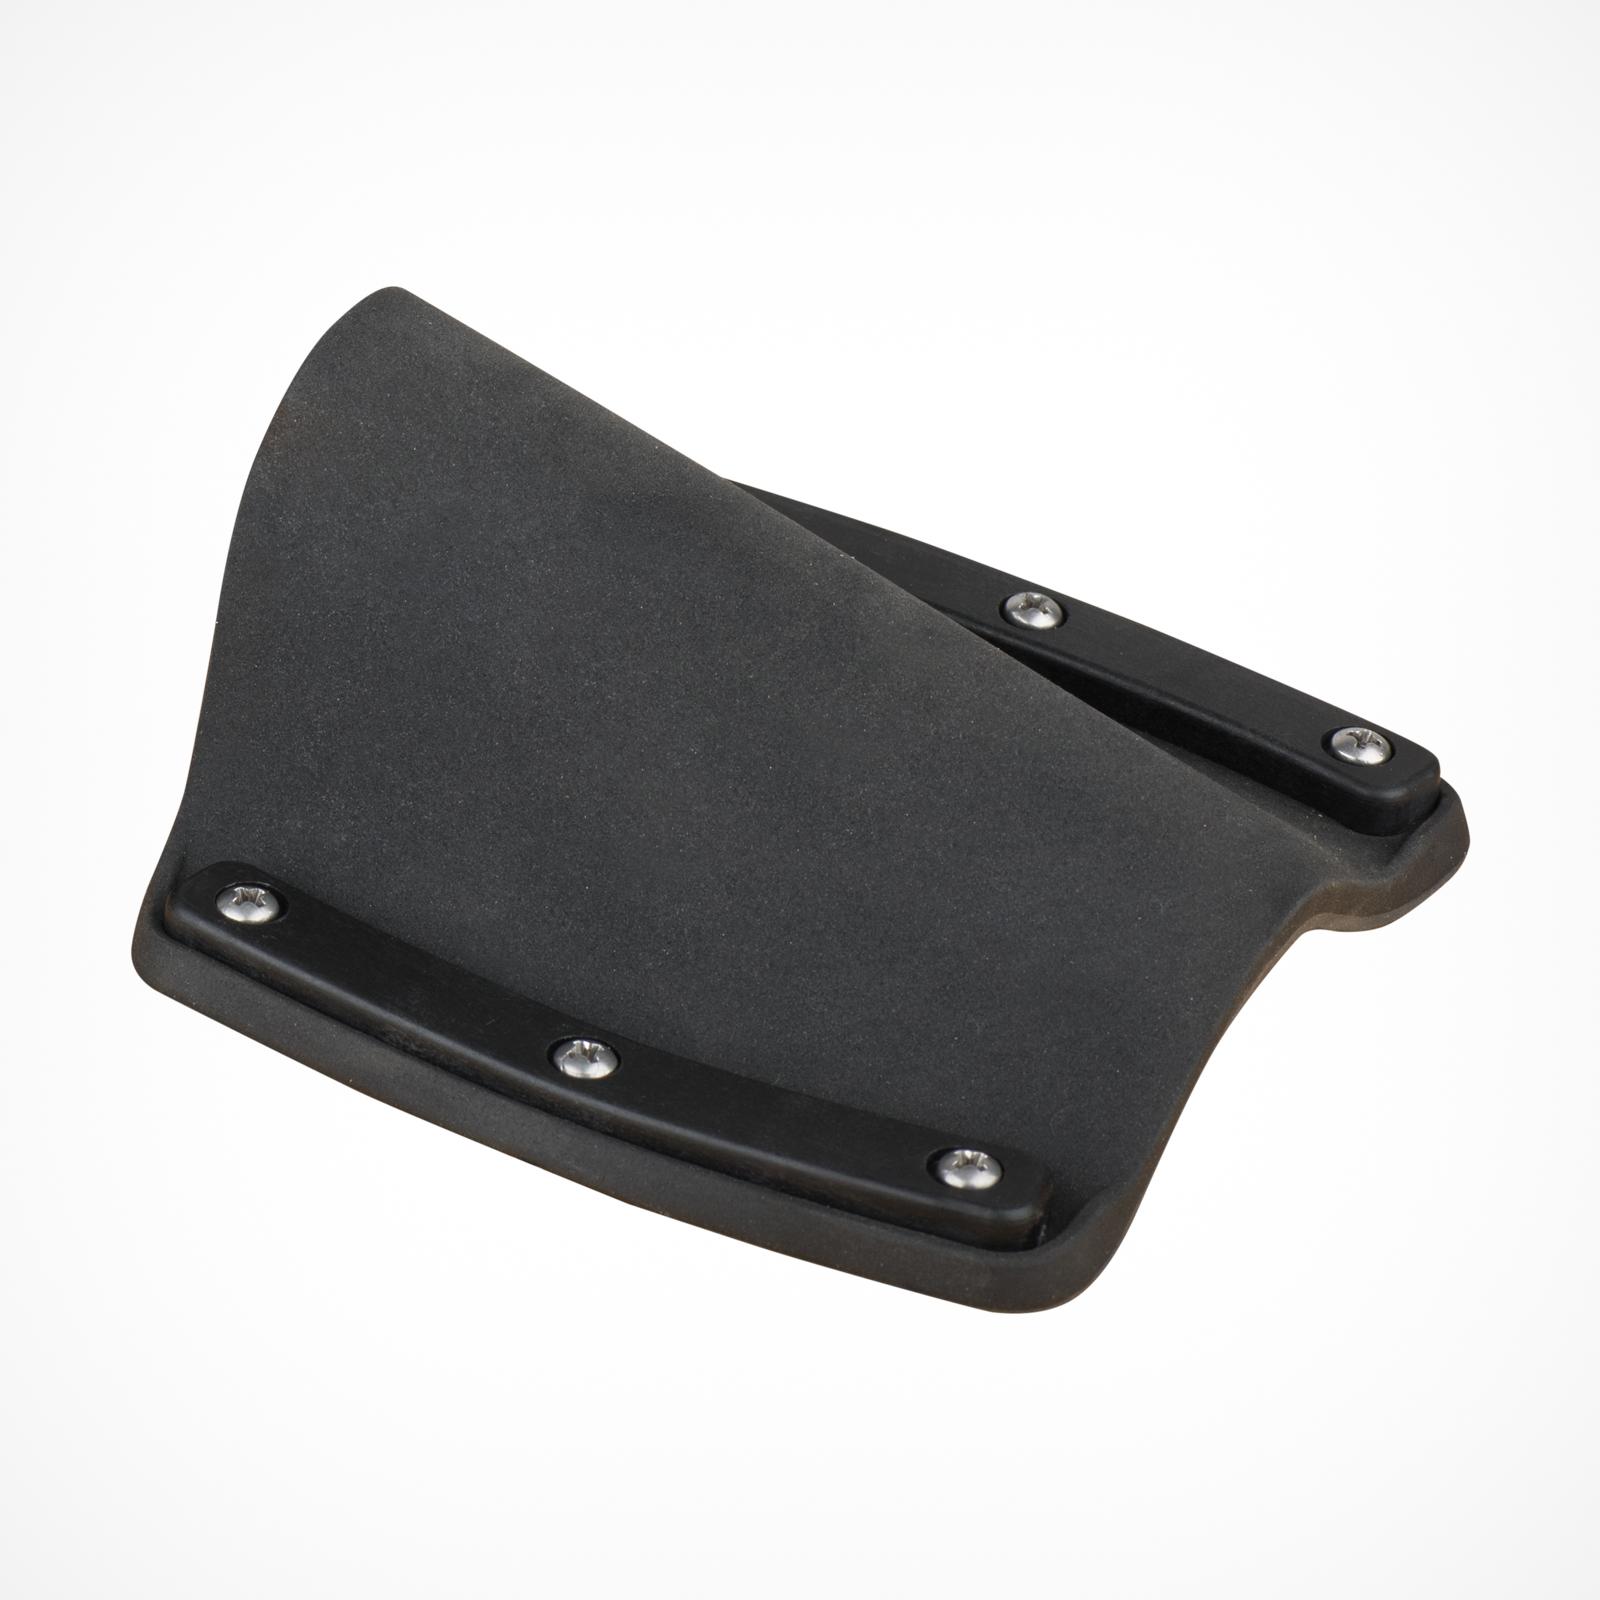 MESLE Water Ski Binding BK Front Toe, product image